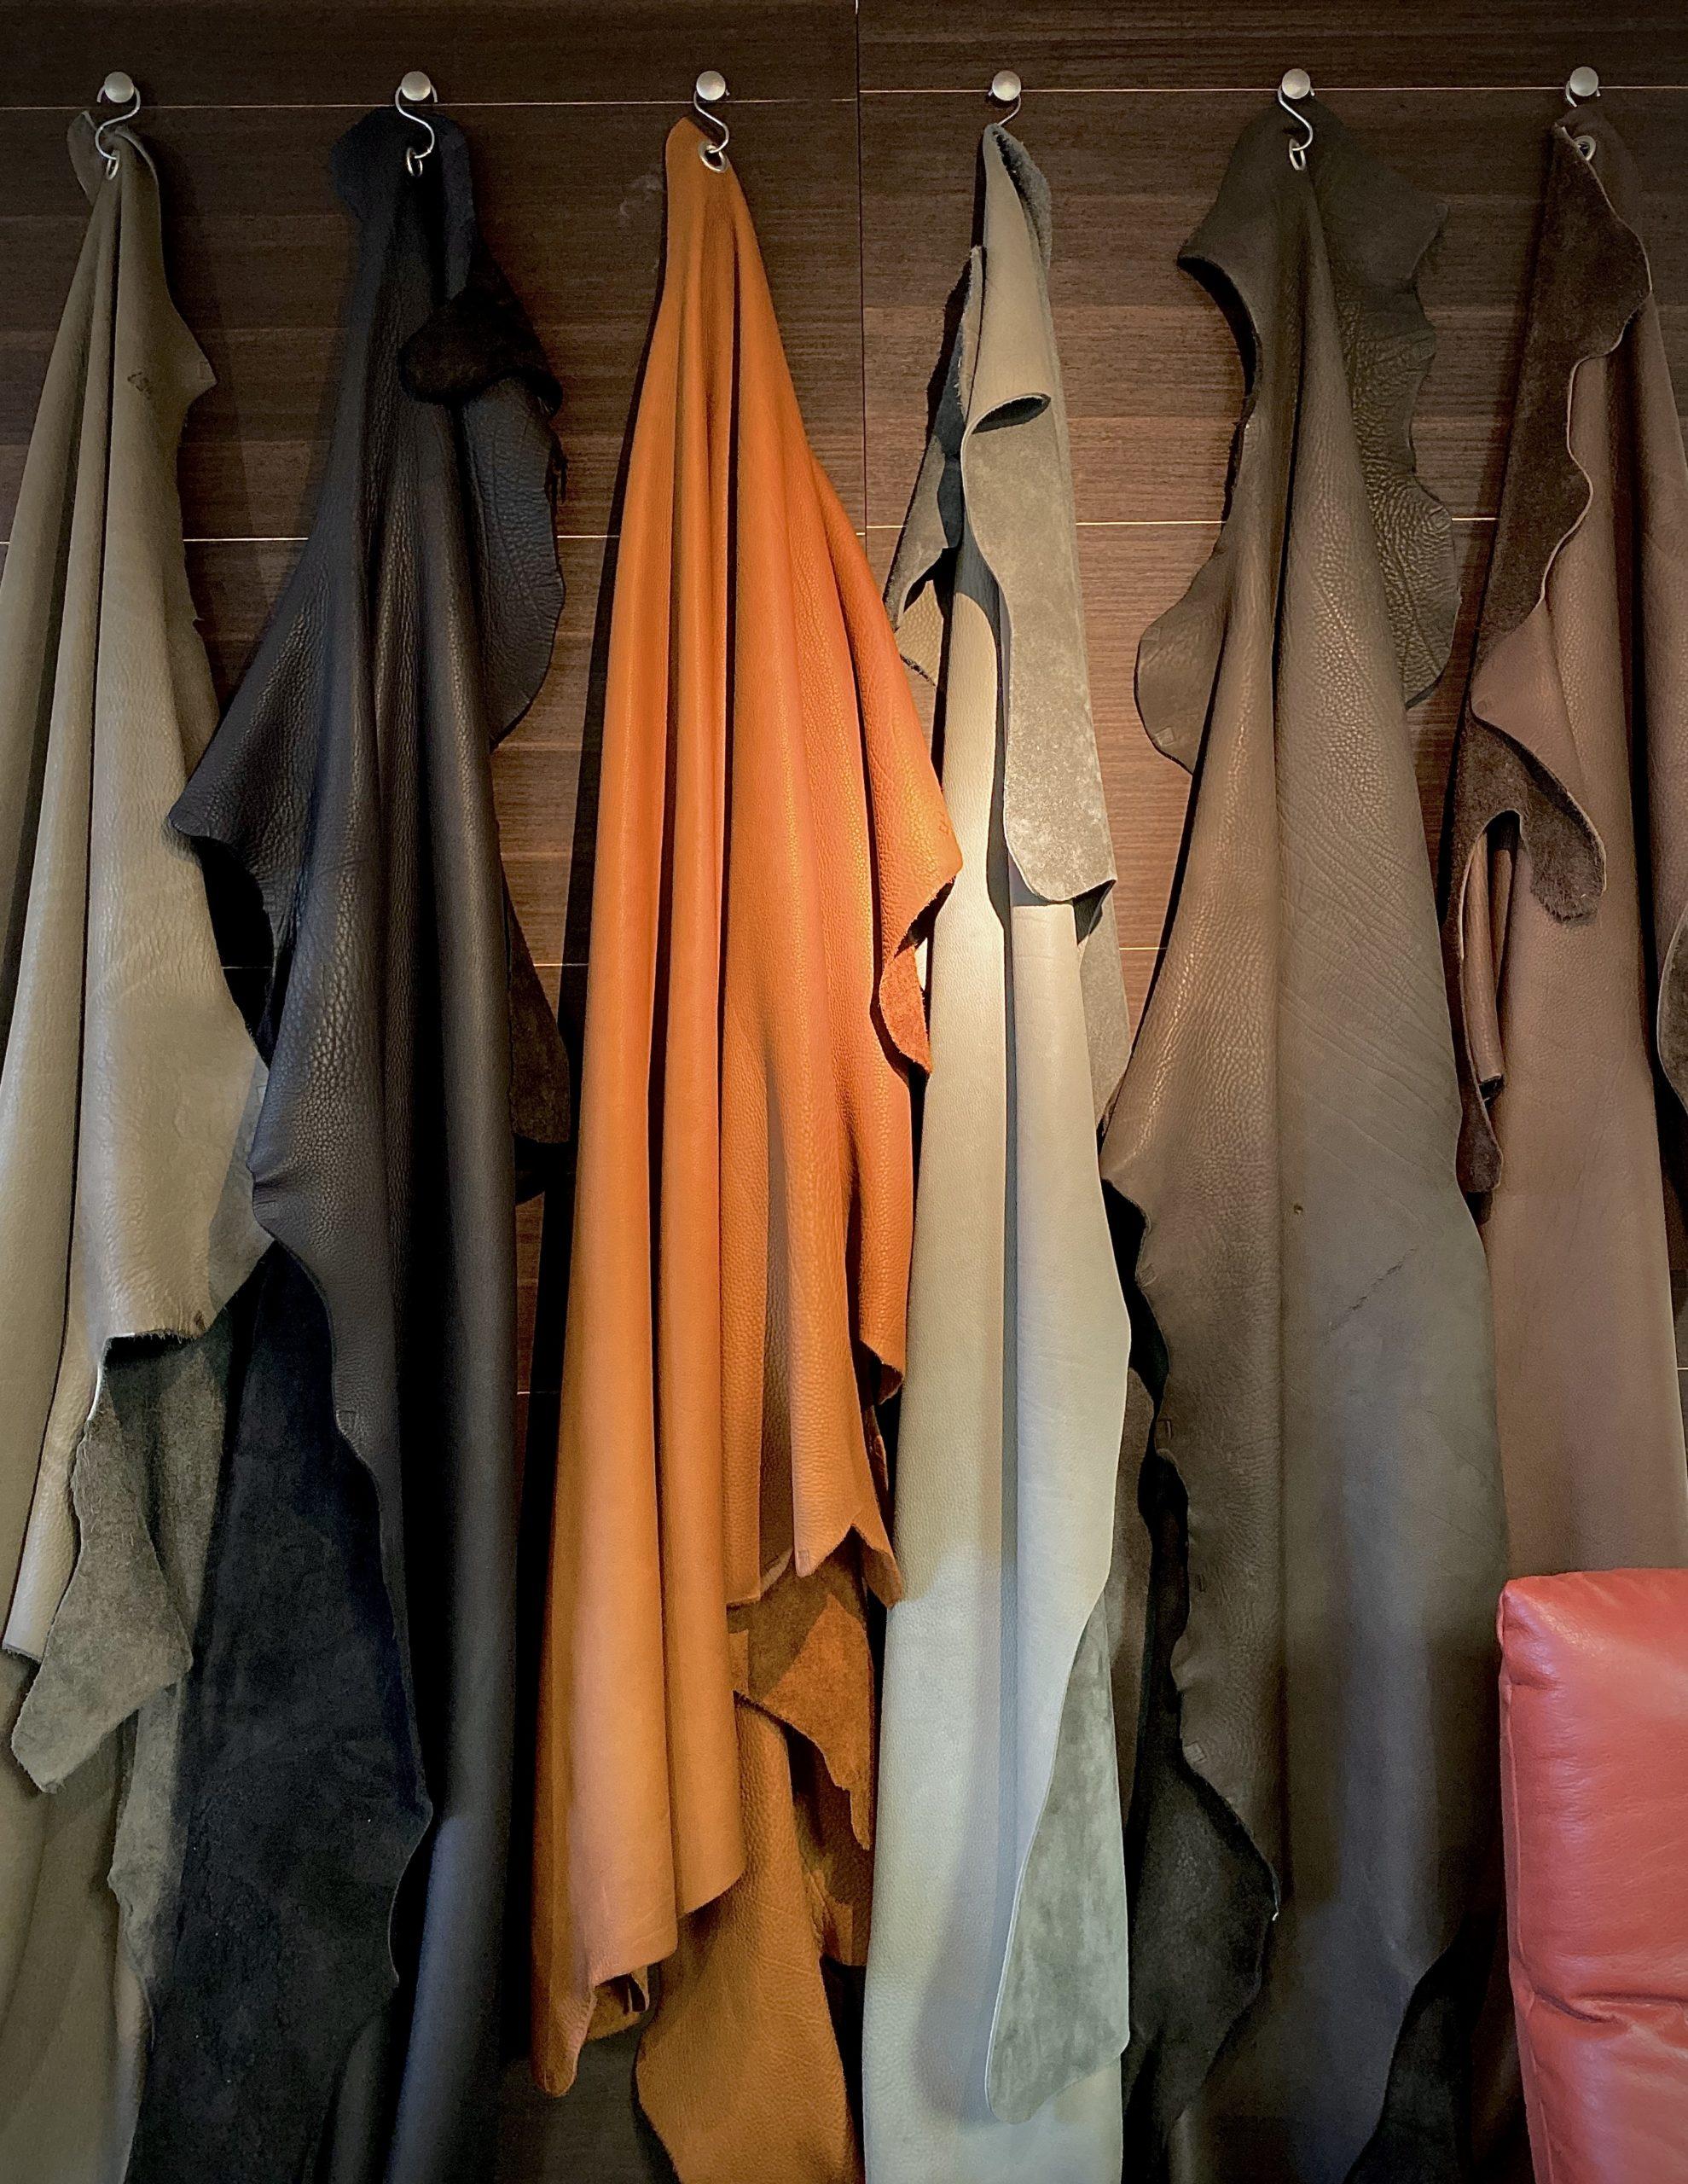 BULL種「ナトゥルレザー」年間2000頭からしか取れない希少な皮革